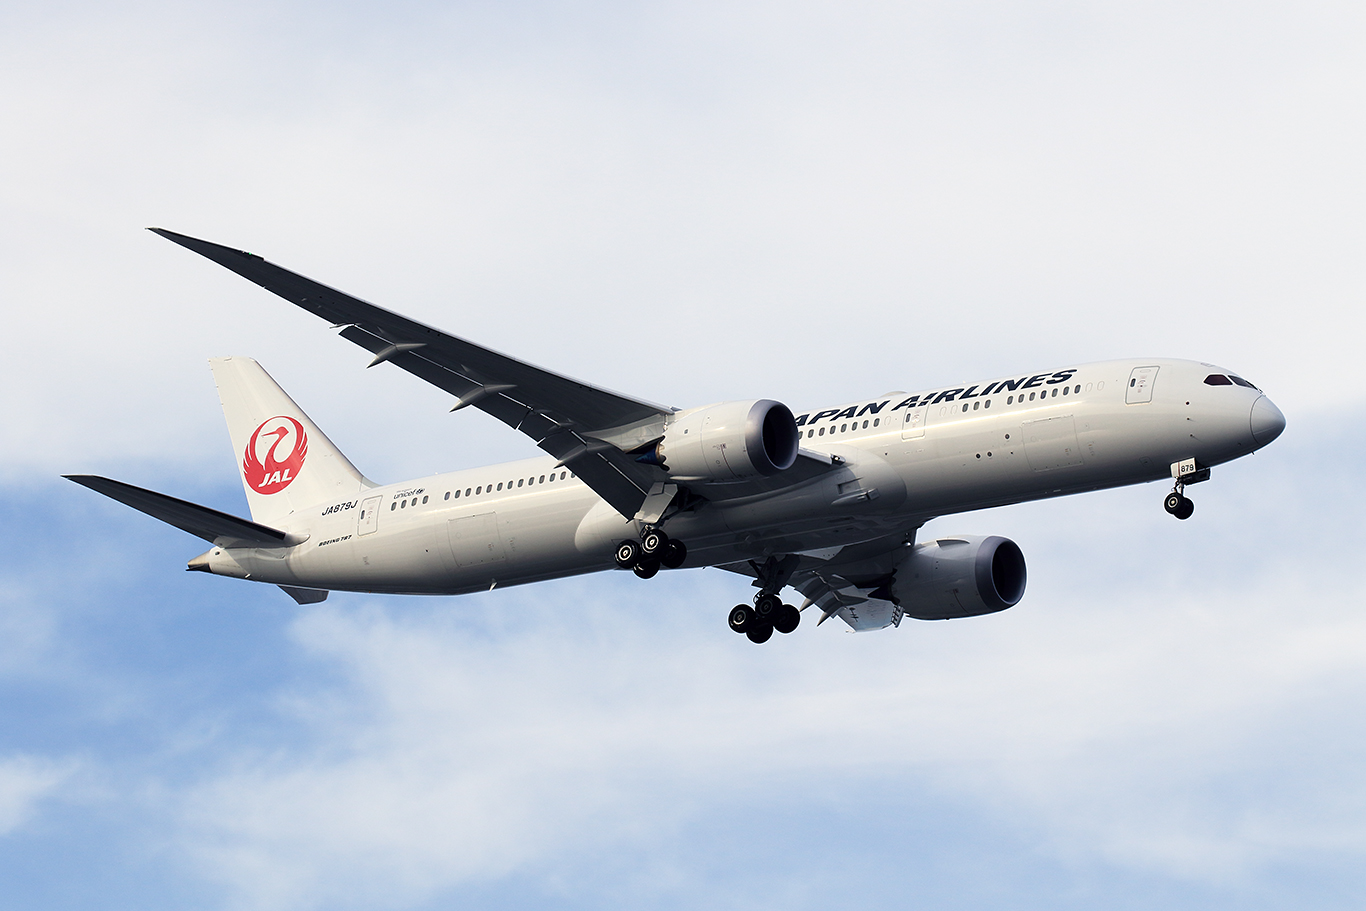 JL/JAL/日本航空 JL542 B737-800 JA301J